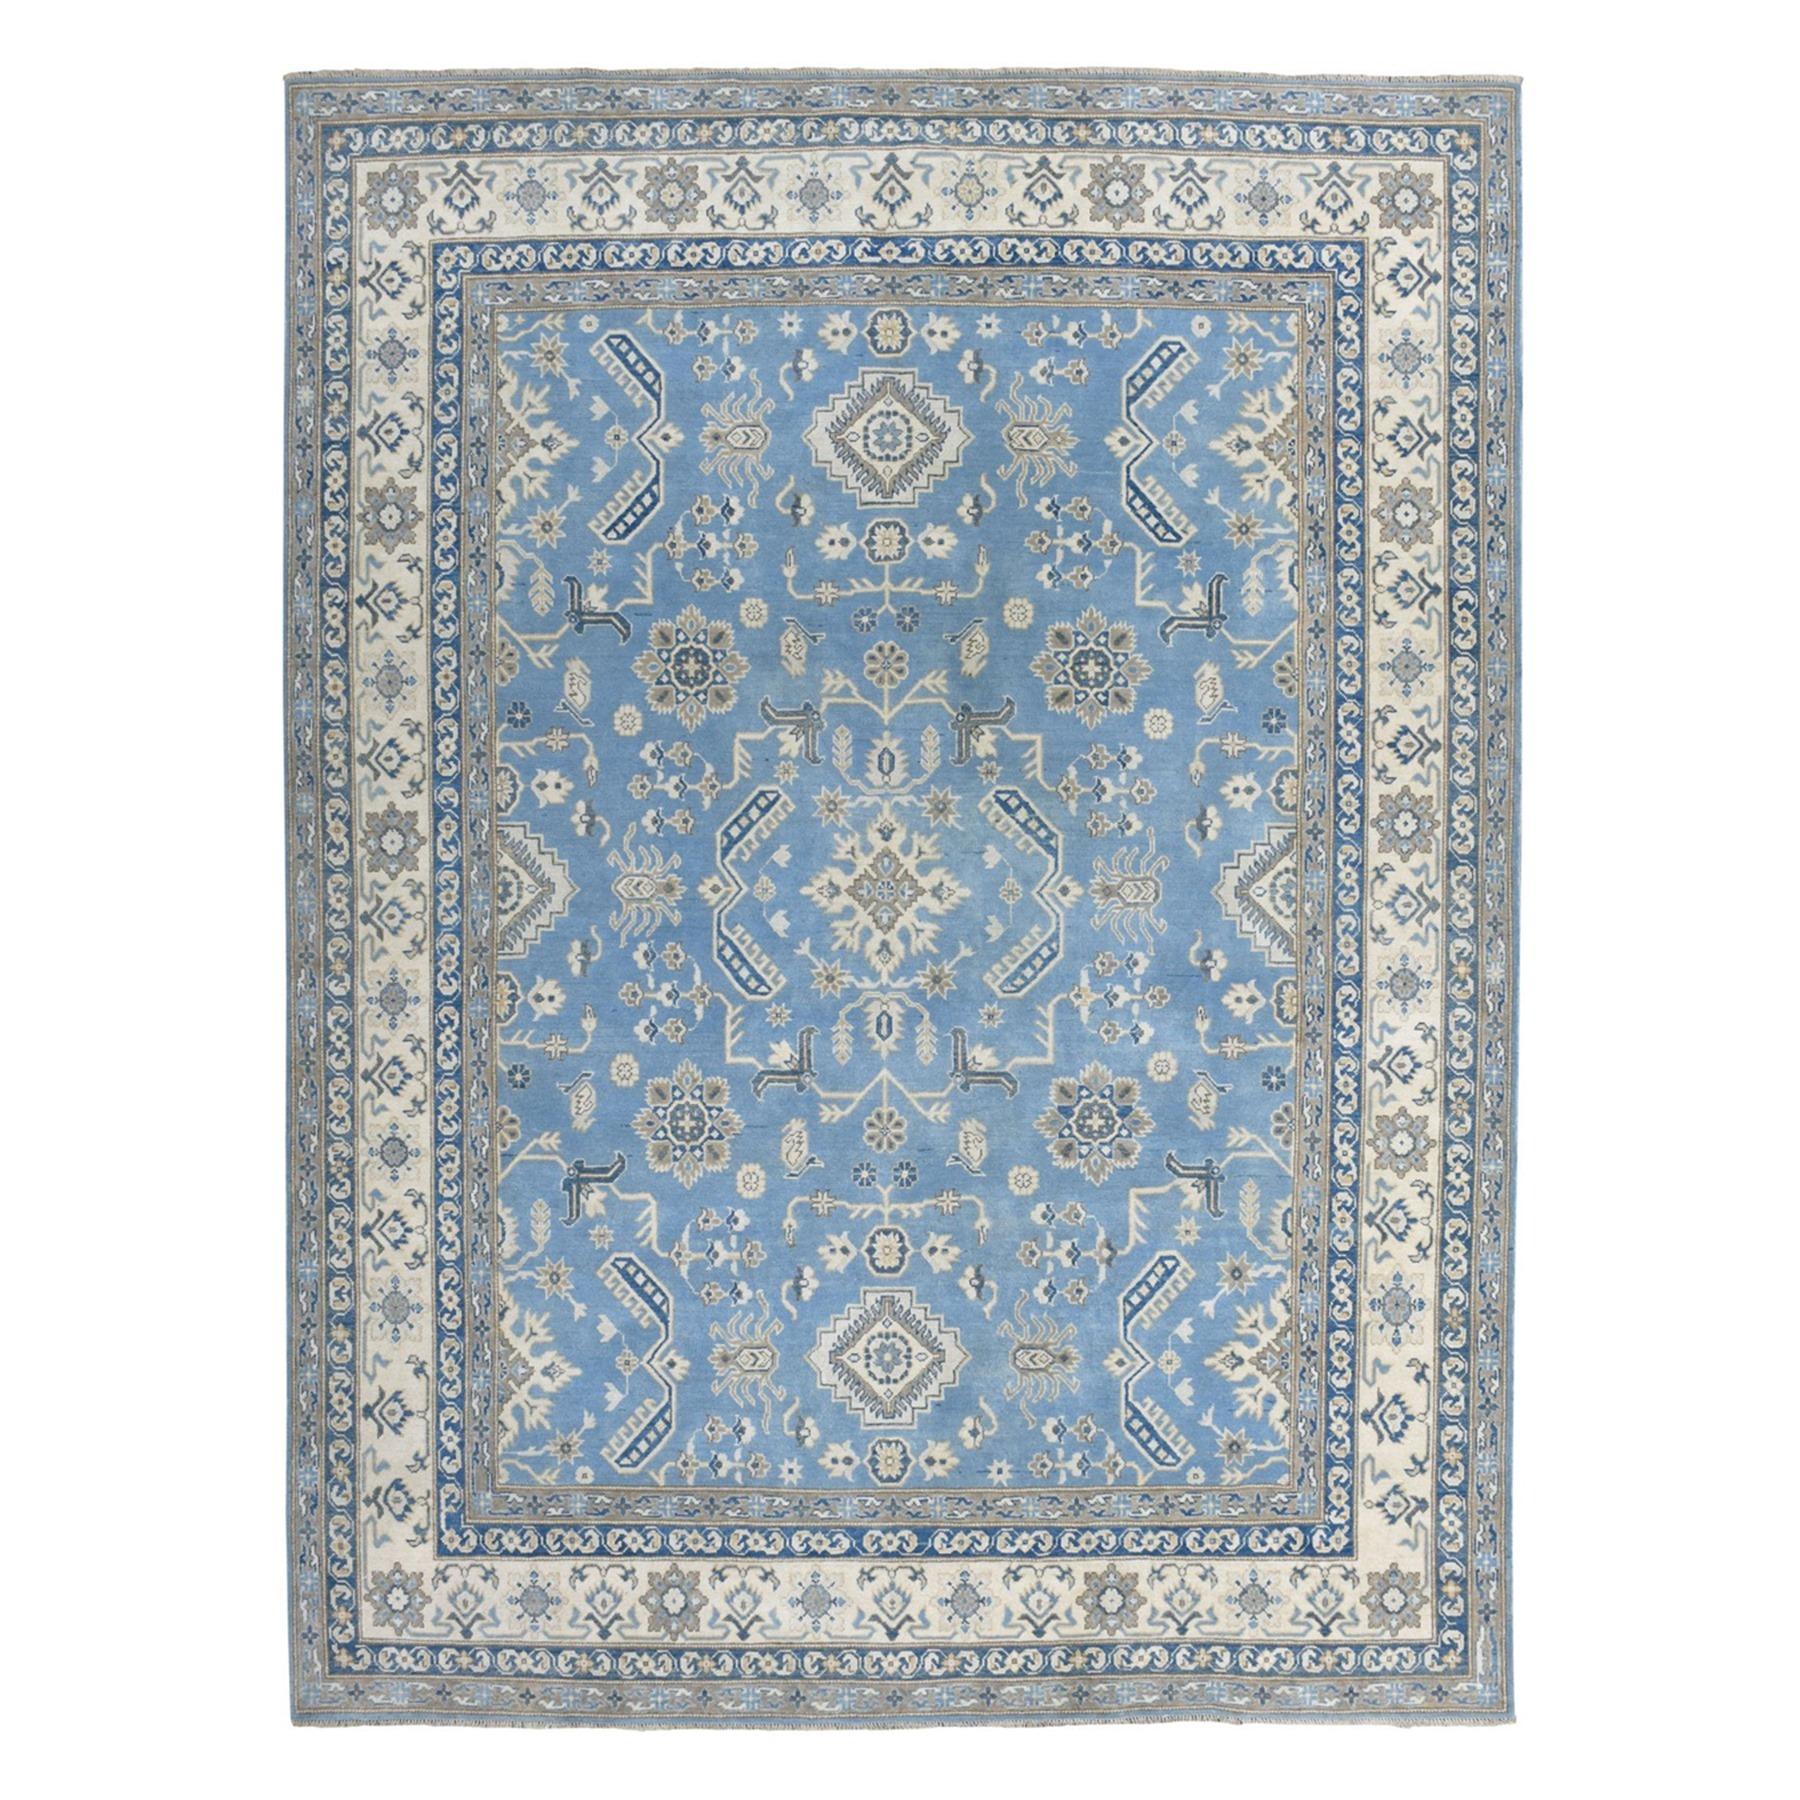 "8'2""X9'9"" Blue Vintage Look Kazak Geometric Design Hand-Knotted Oriental Rug moaeaaa8"